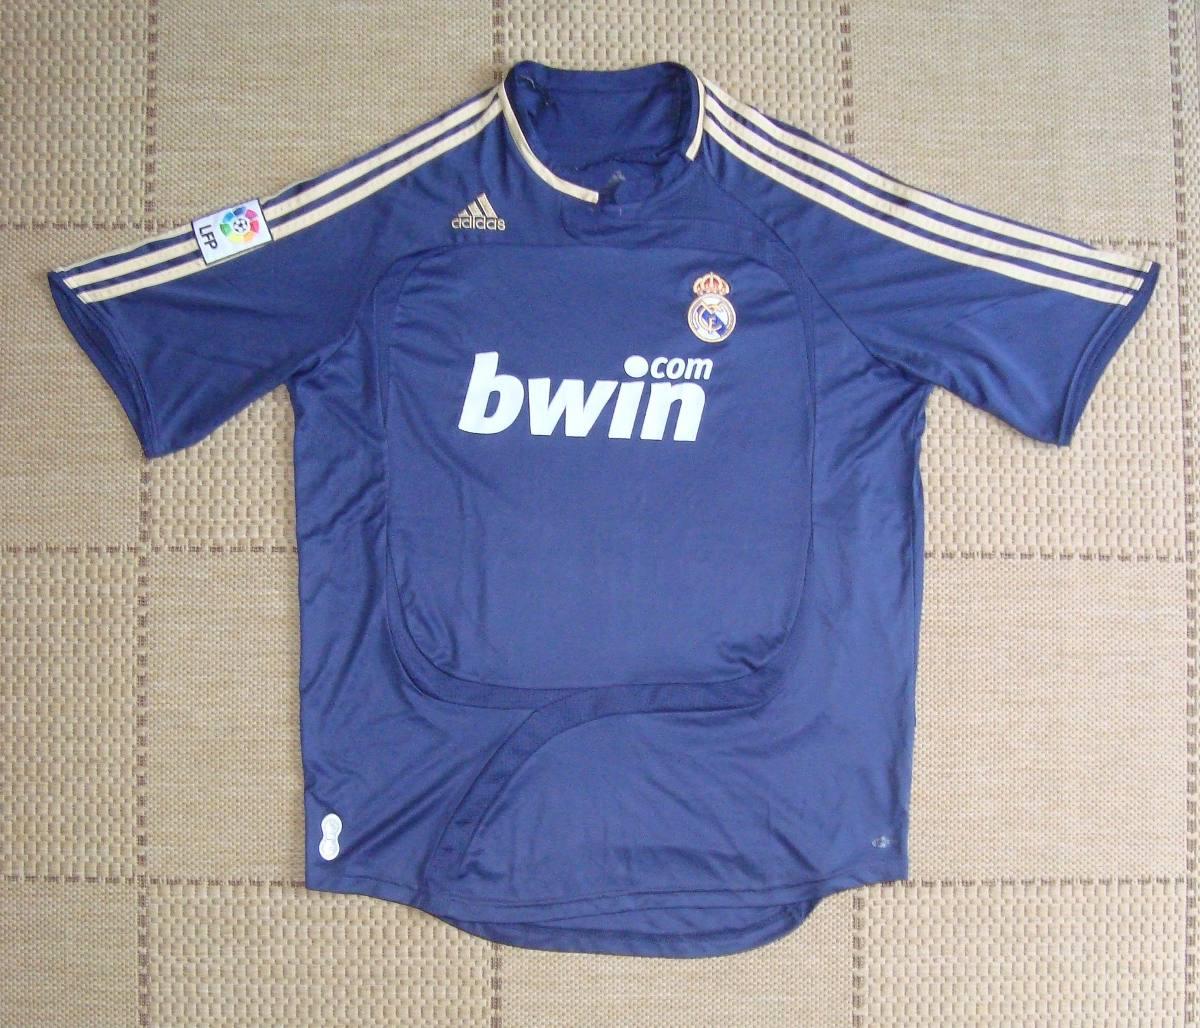 camisa original real madrid 2007 2008 away. Carregando zoom. 7dd90fb2c2820